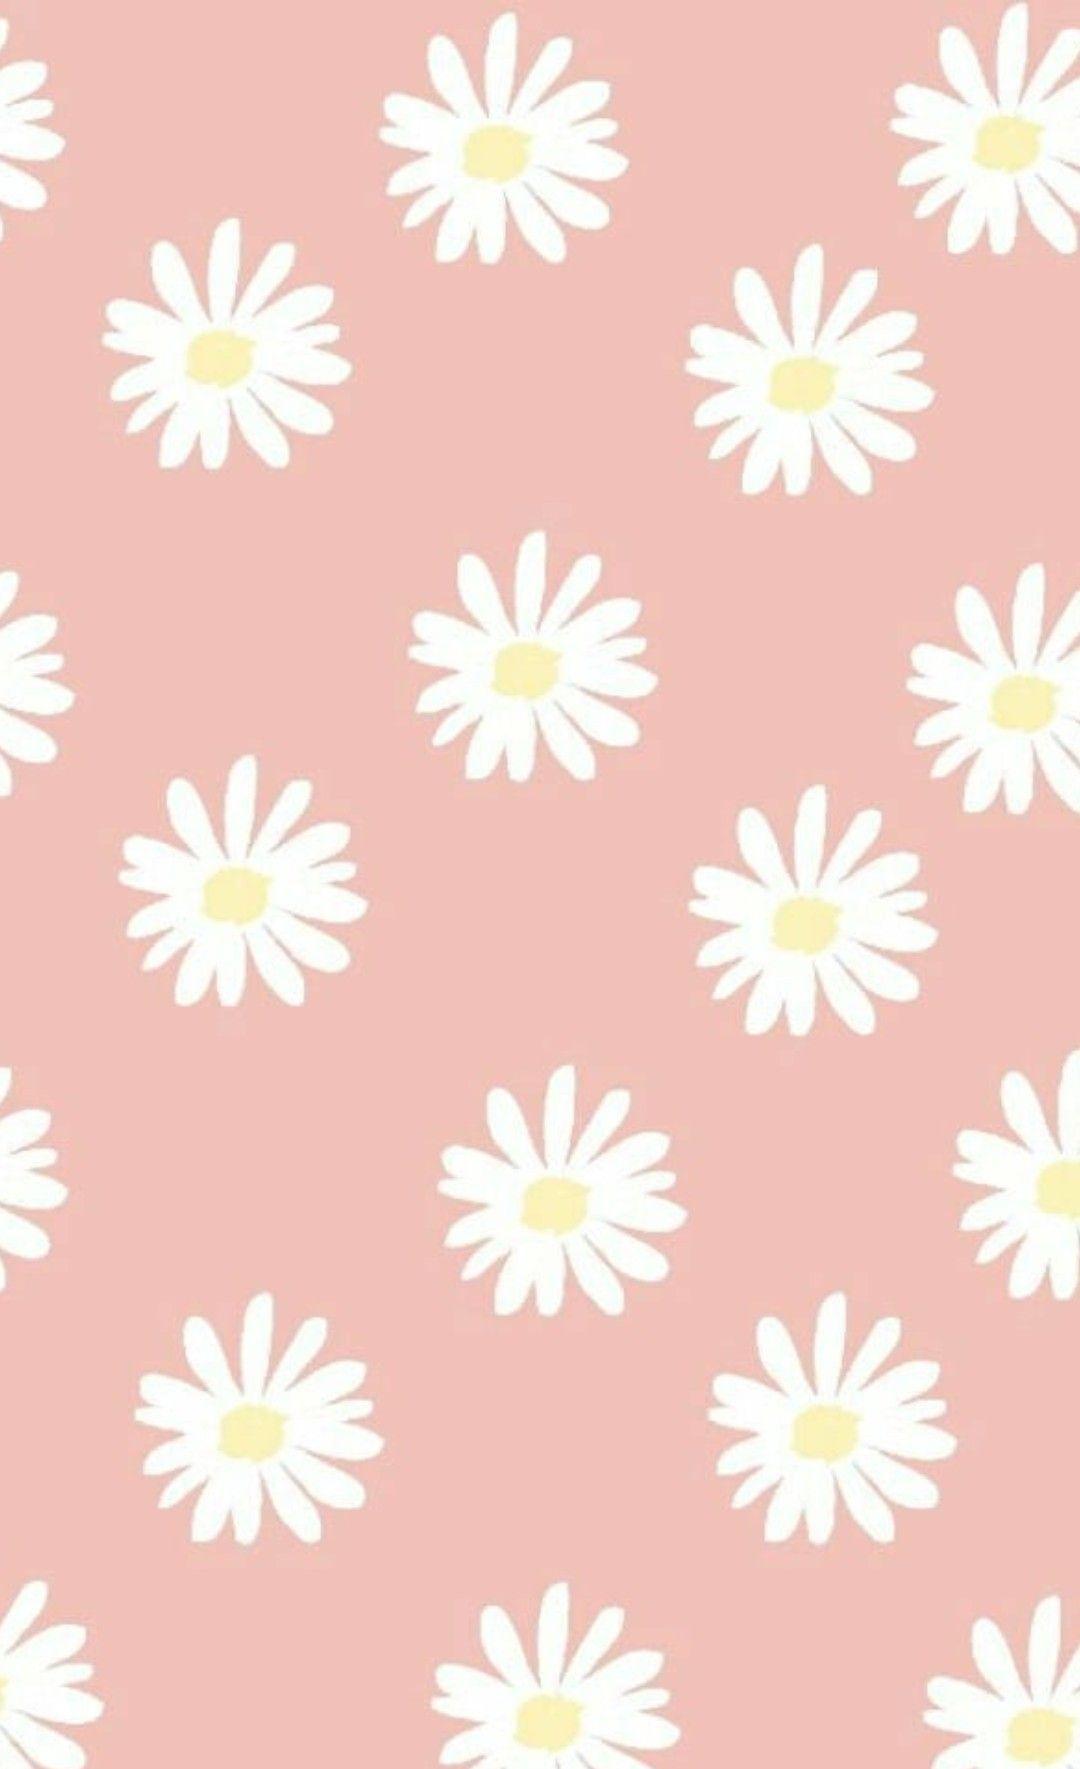 Pin By Bleu Belle On Patterns Tumblr Iphone Wallpaper Vintage Flowers Wallpaper Spring Wallpaper